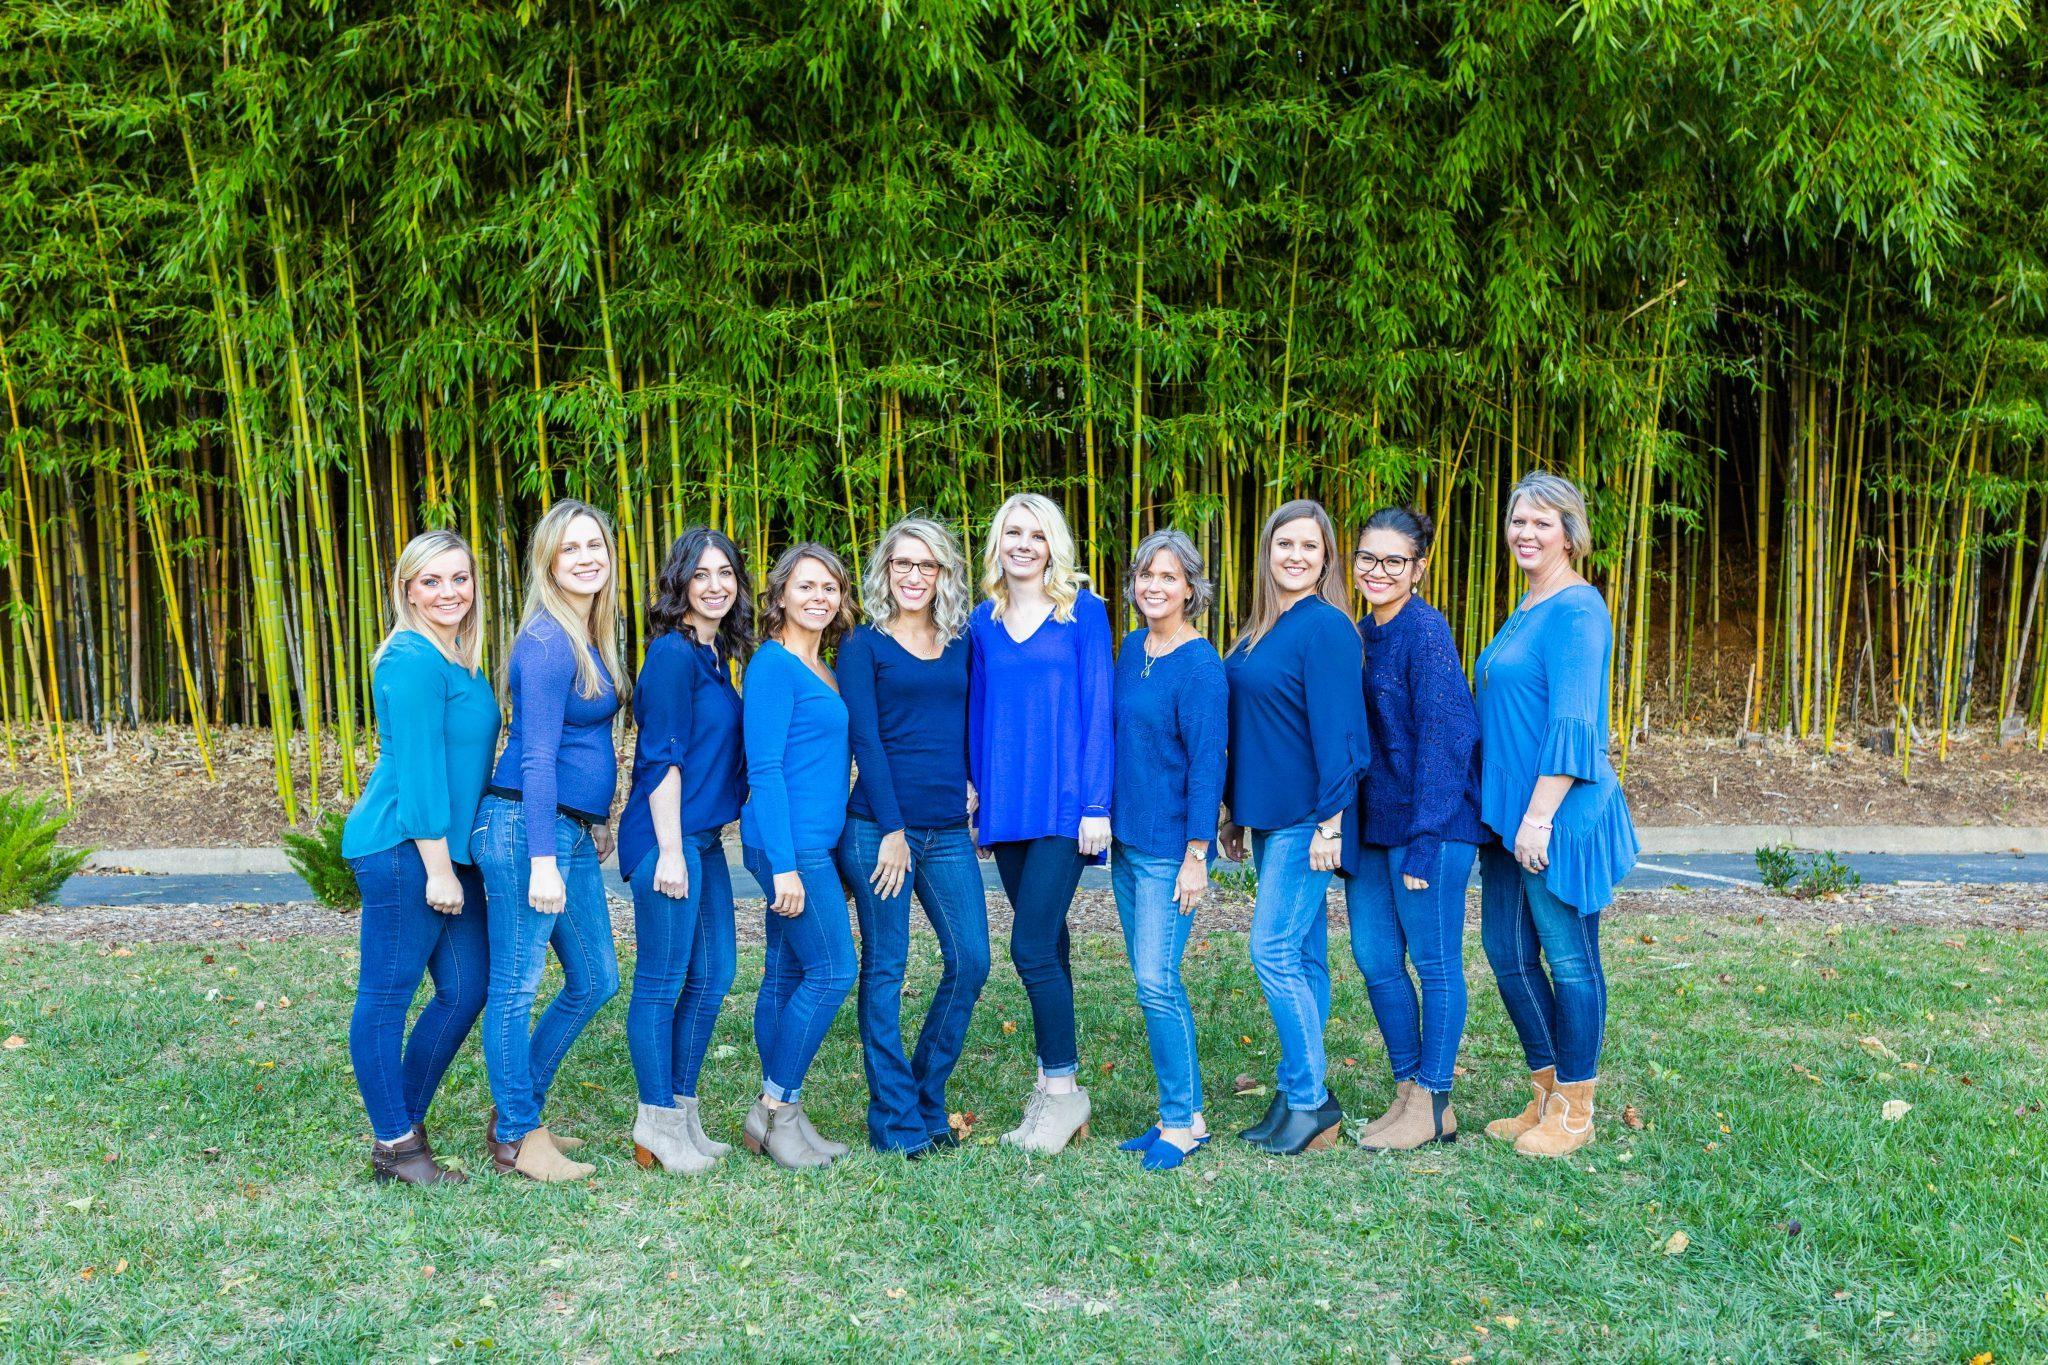 Staff picture for Blue Ridge Orthodontics in Hendersonville